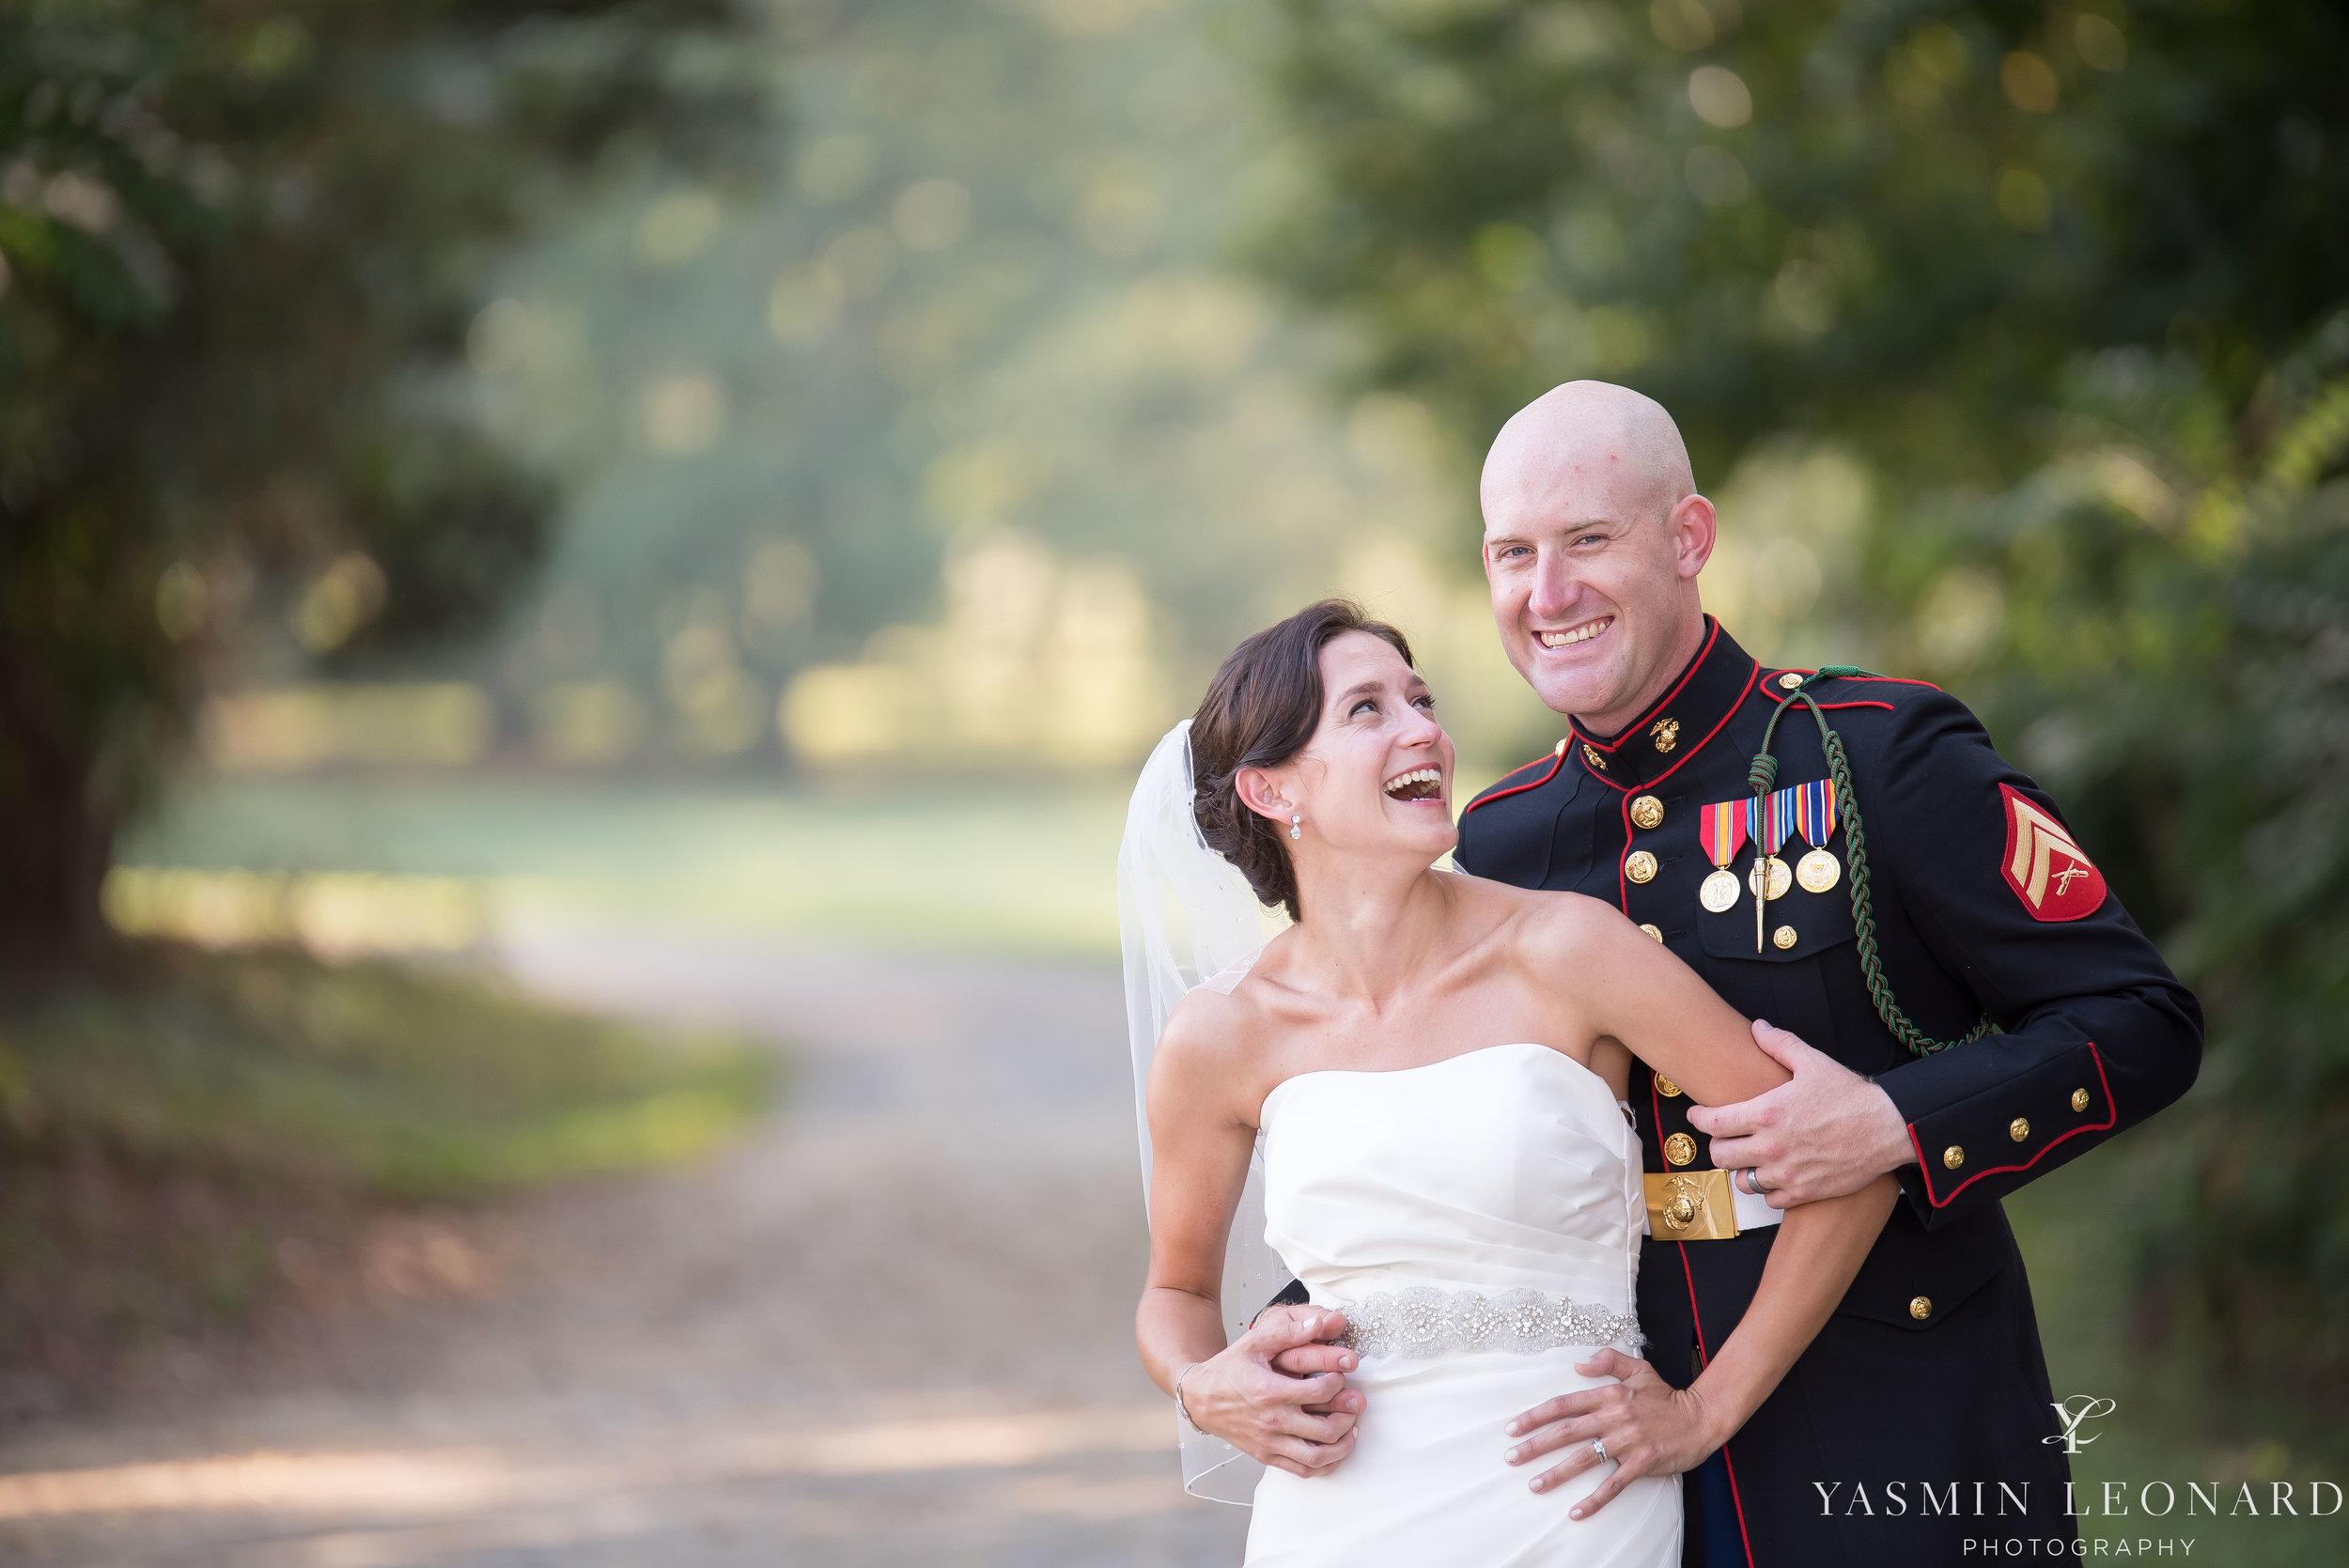 Sara and Nathan | Summerfield Farms | Yasmin Leonard Photography-50.jpg